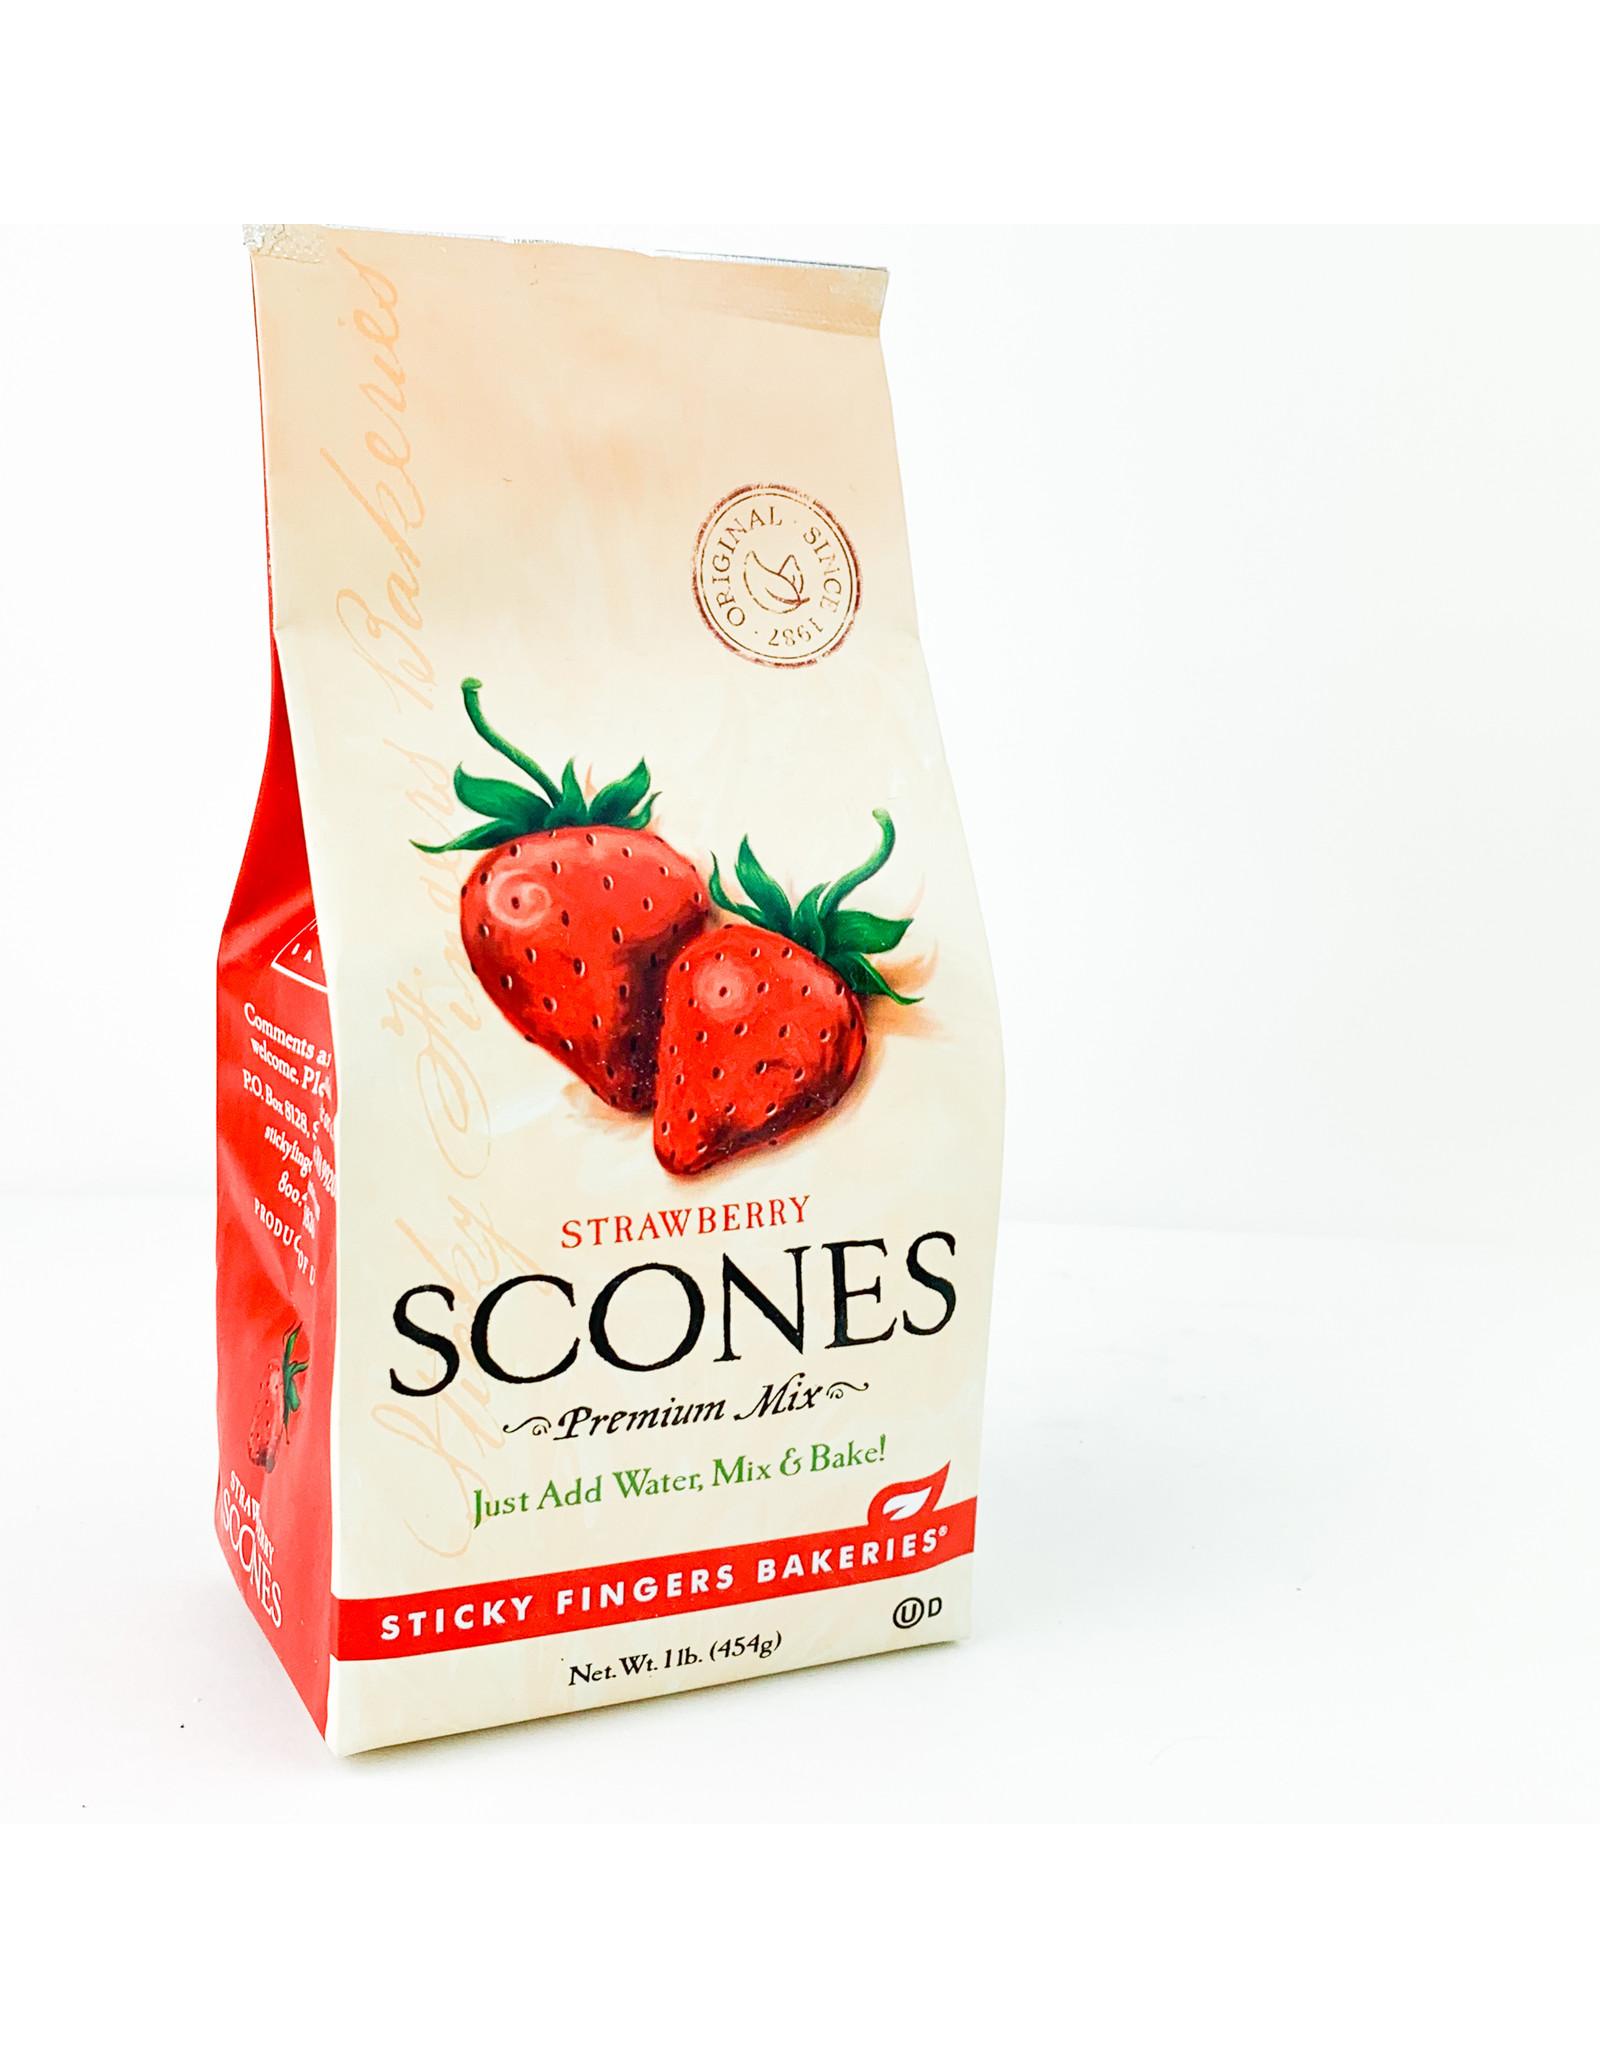 Sticky Fingers Bakeries Strawberry Scone Mix